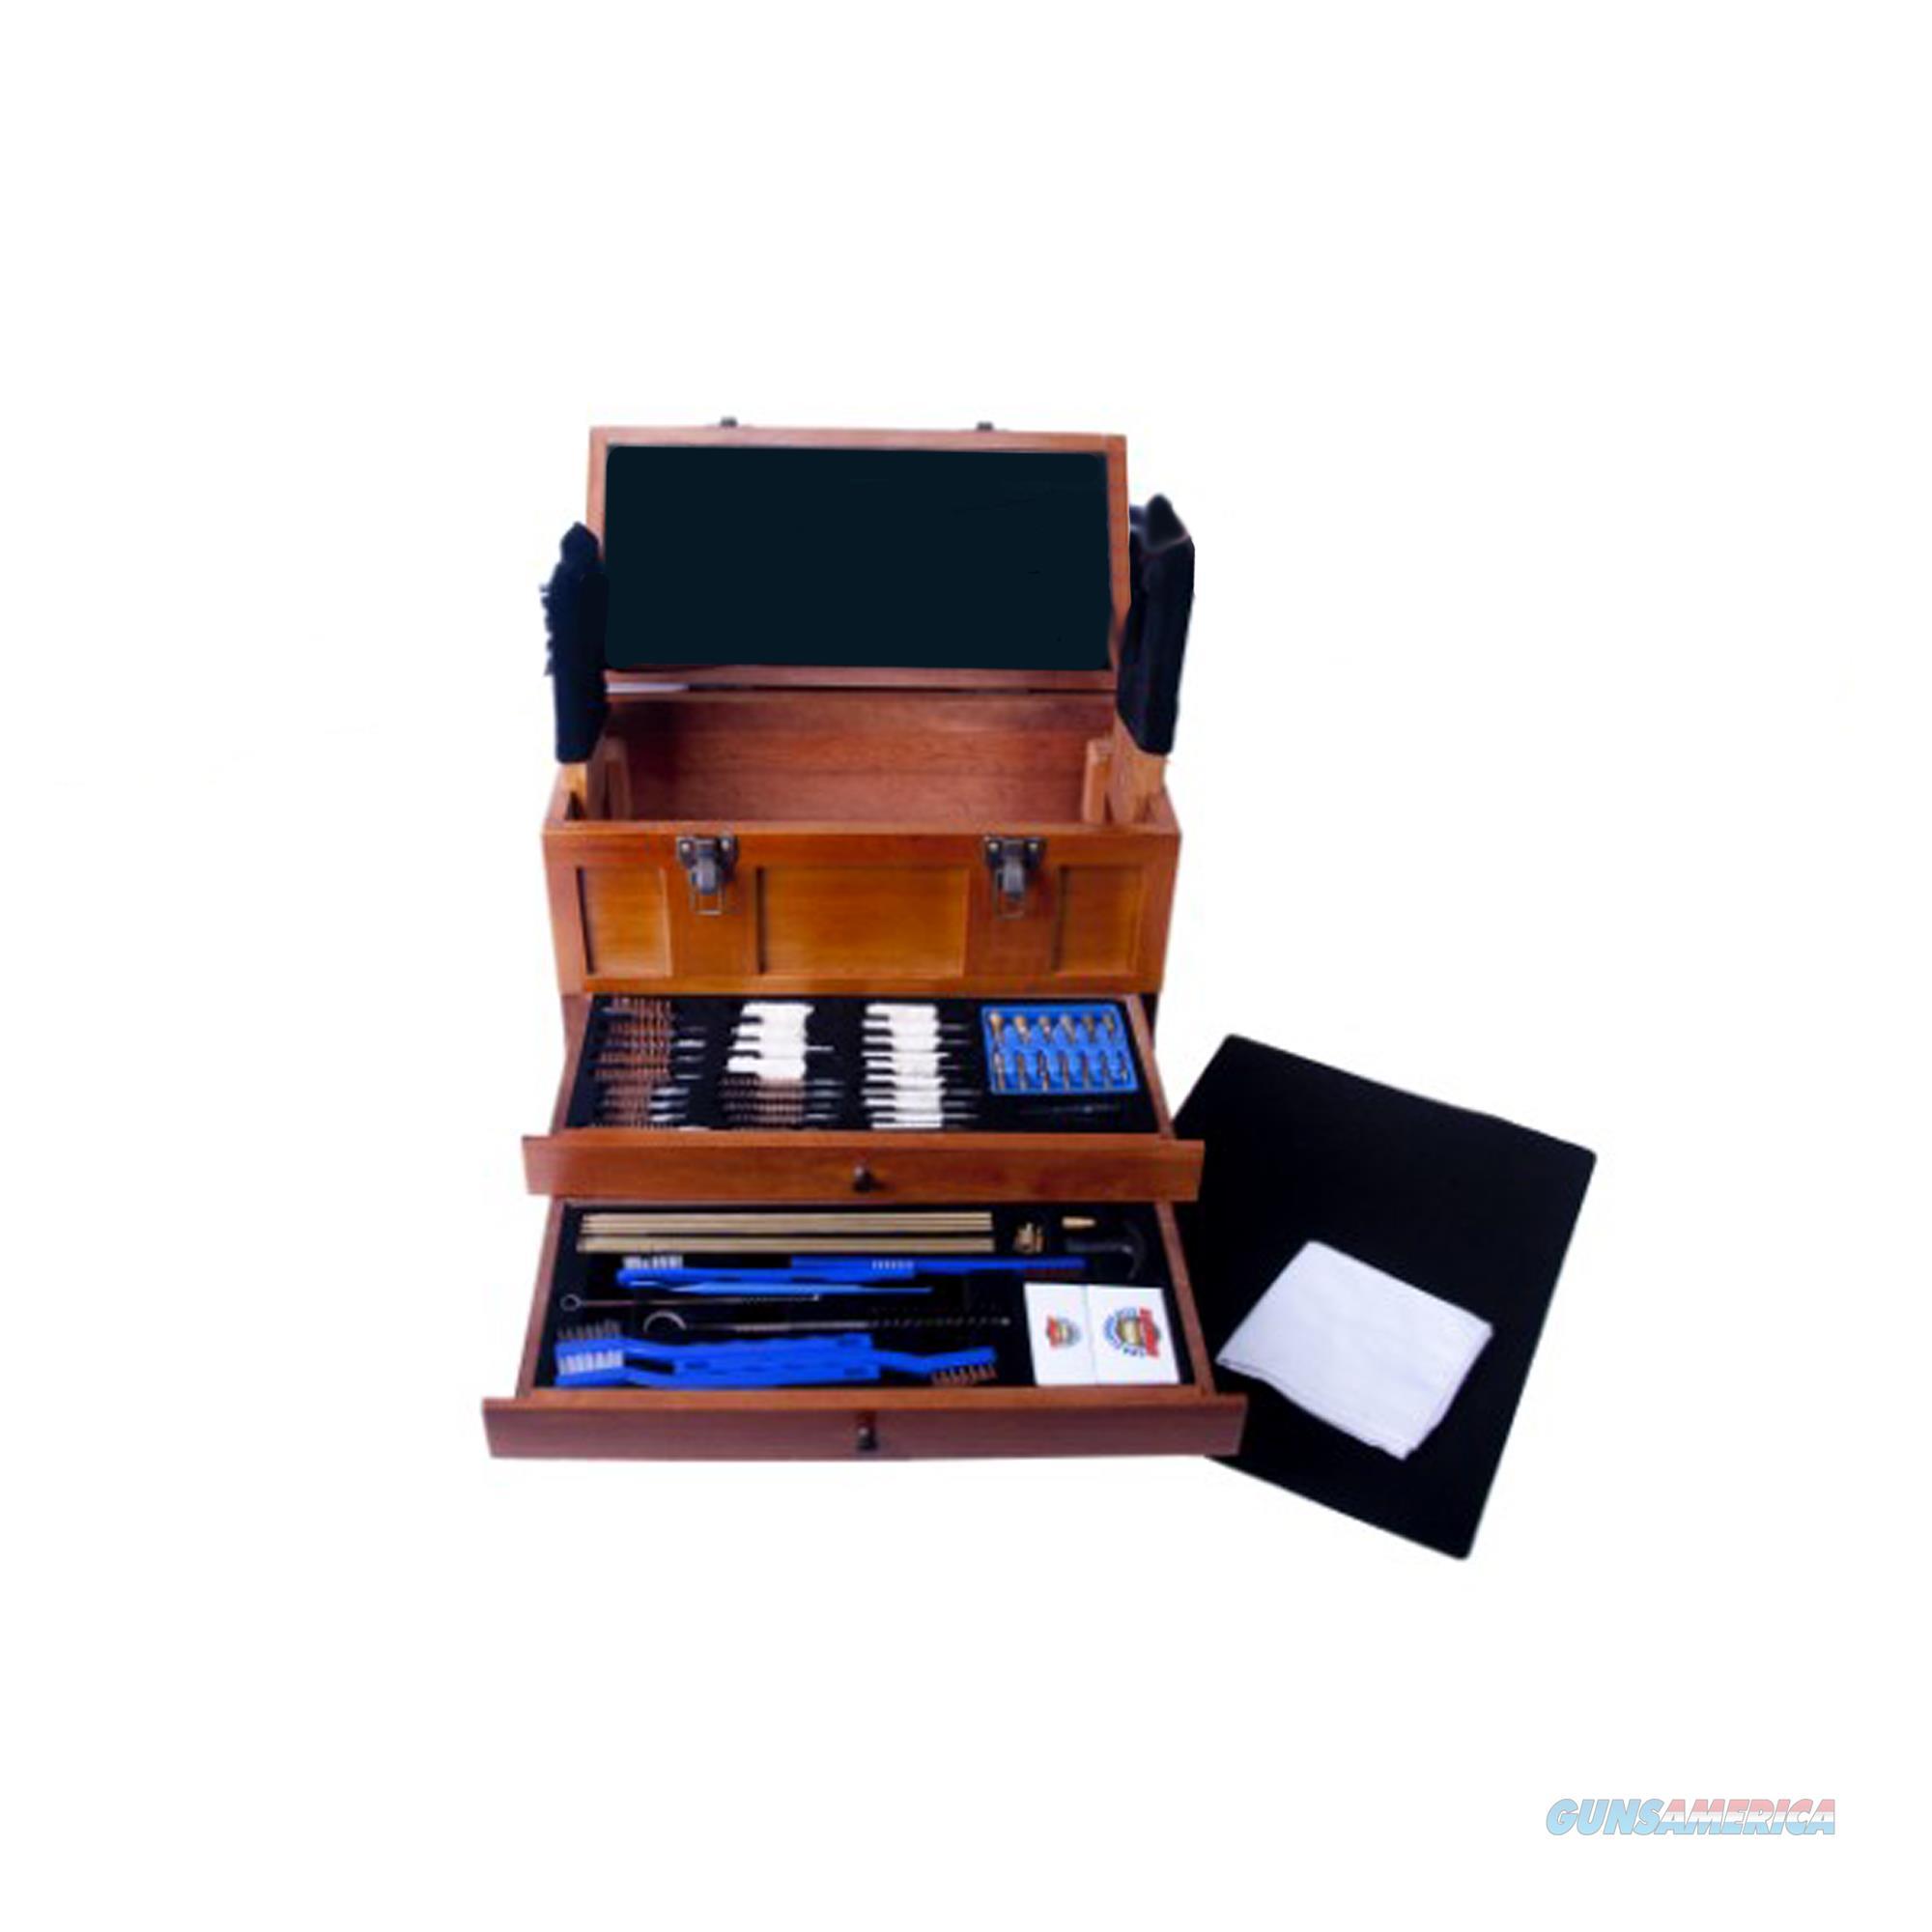 Dac Technologies Wooden Toolbox With Universal Gun Cleaning Kit TBX 96-W  Non-Guns > Gunsmith Tools/Supplies